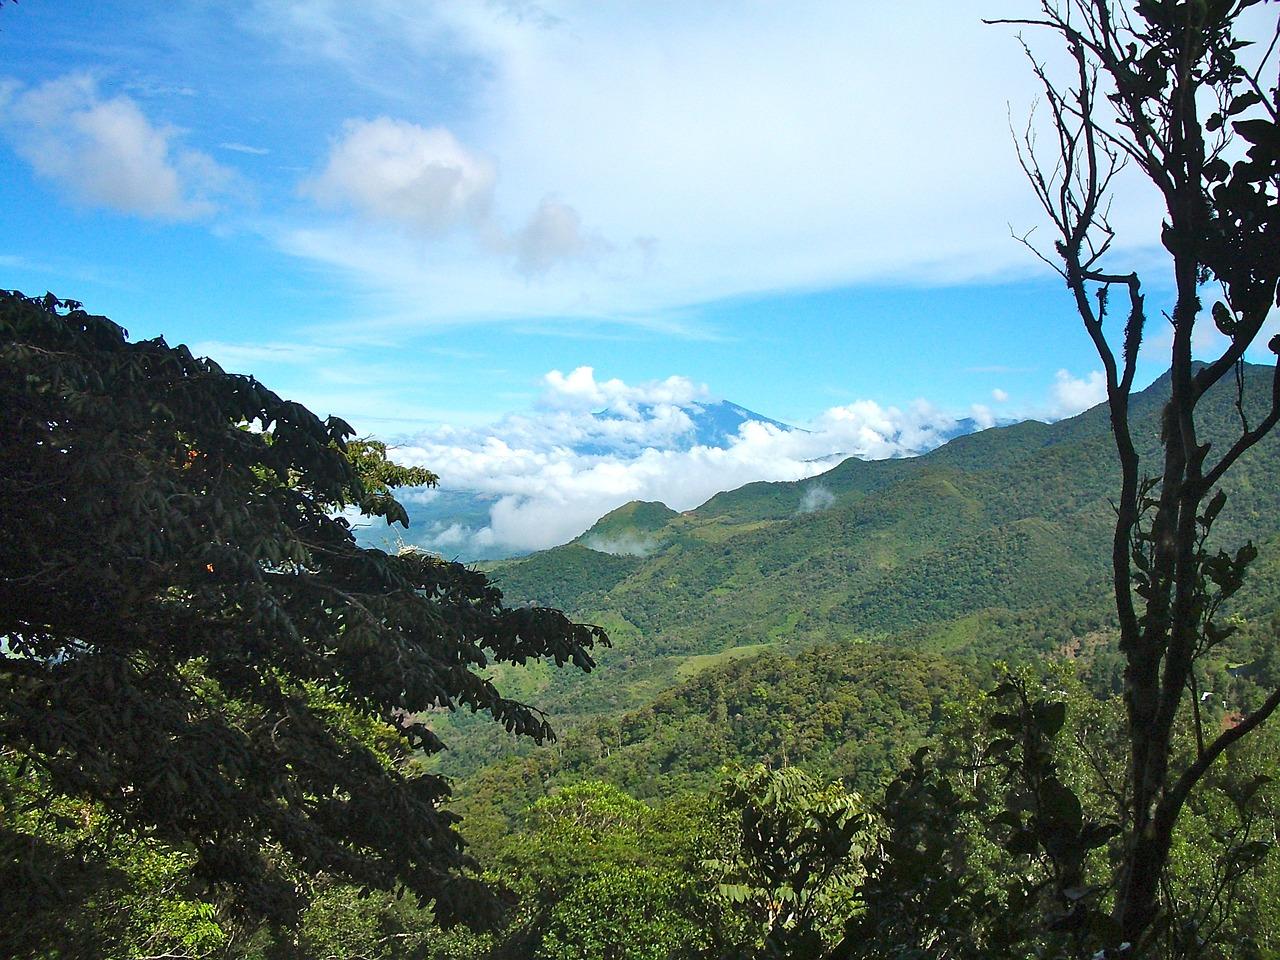 Cost of Living in Boquete, Panama